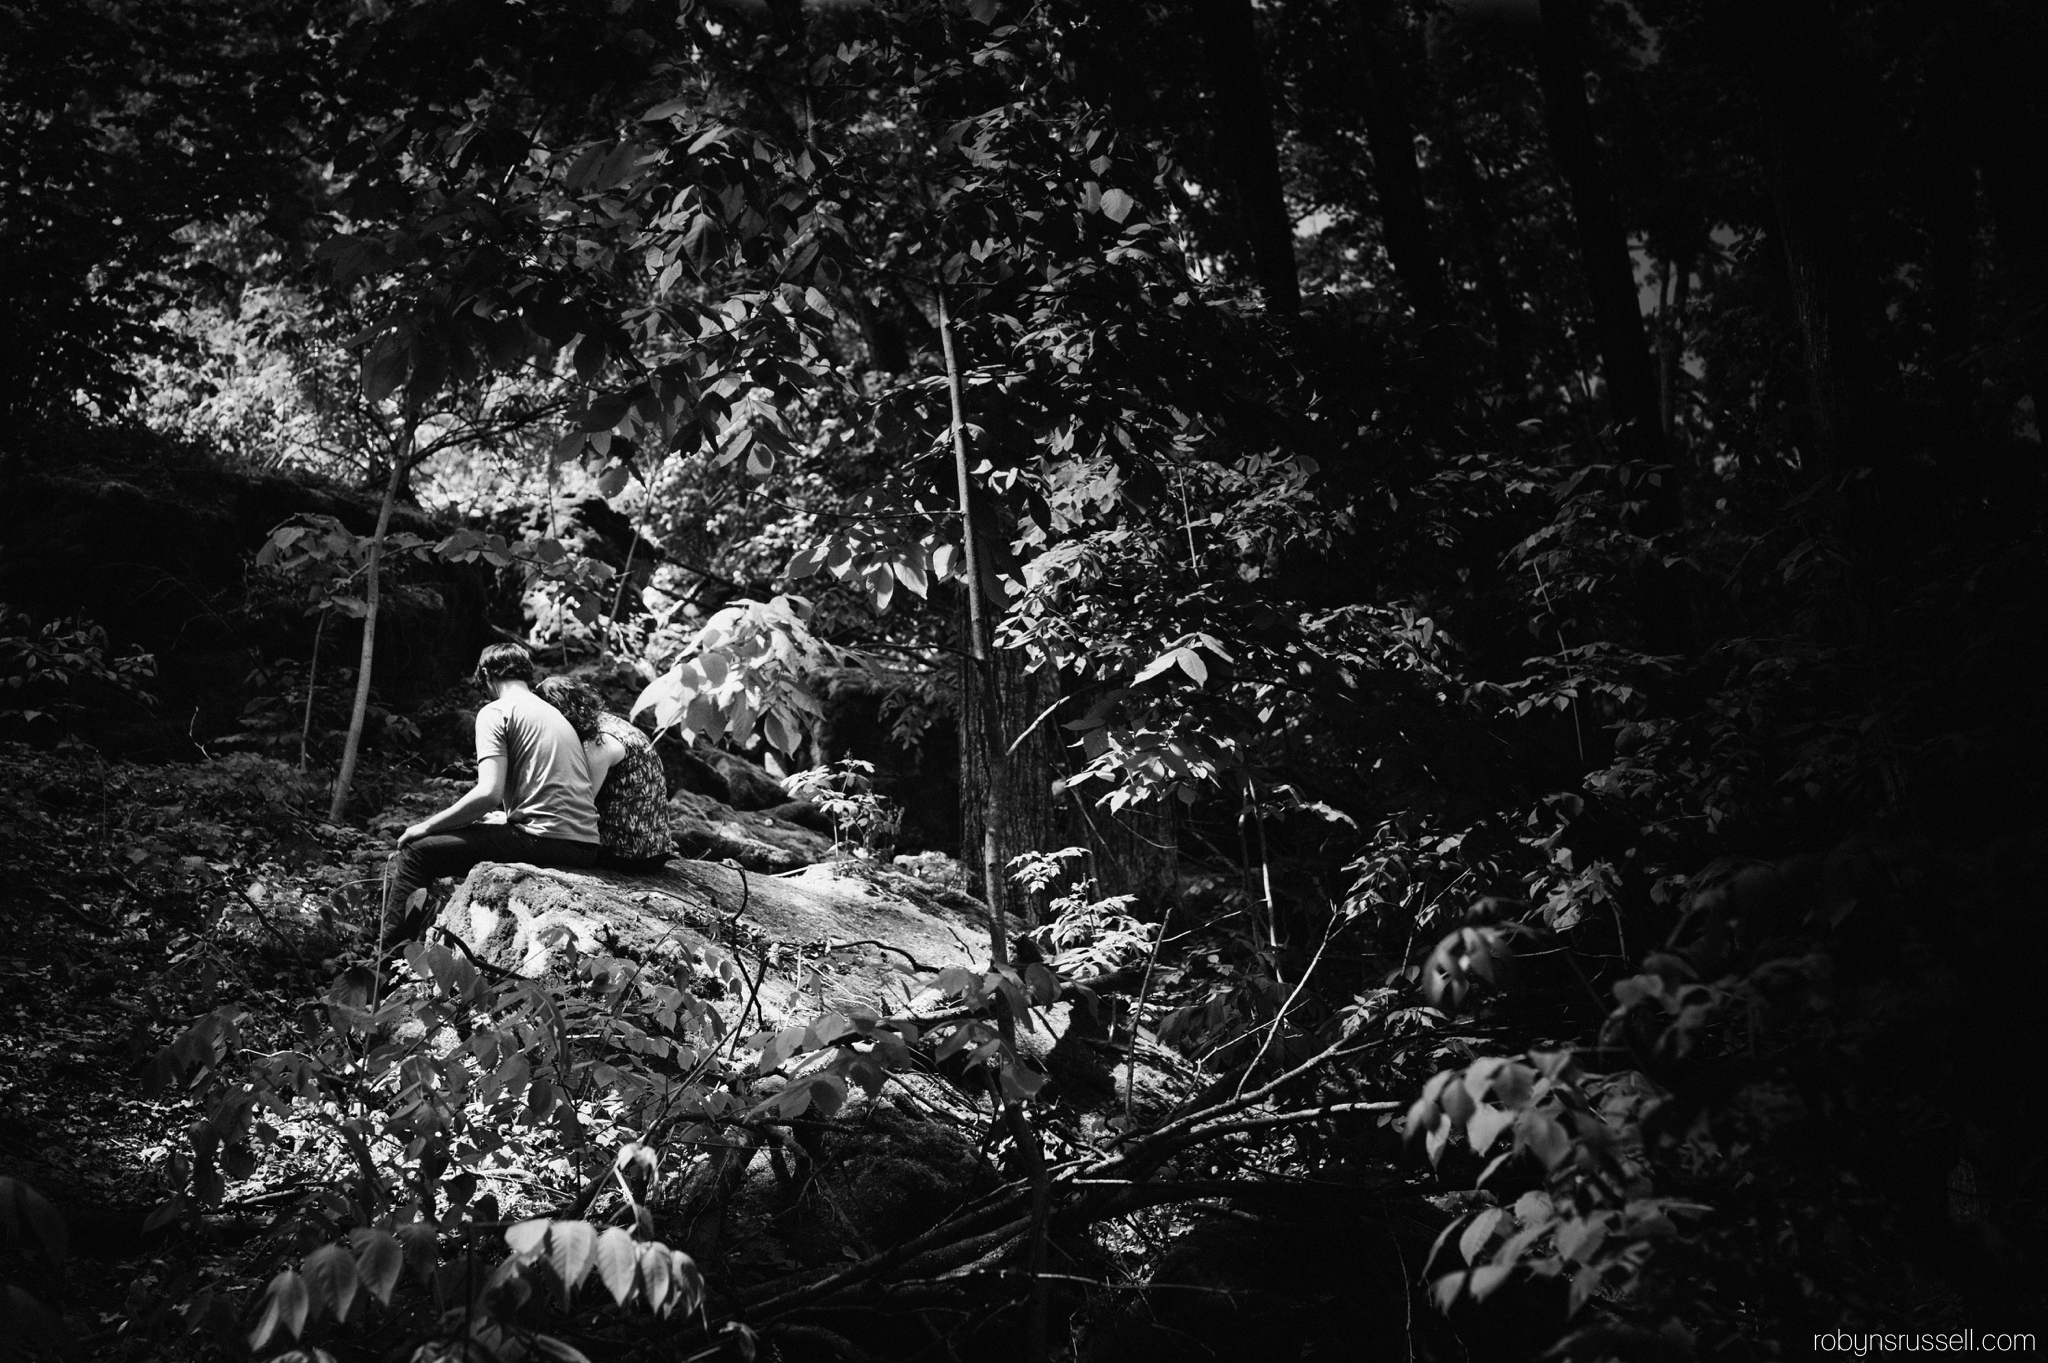 5-dramatic-black-and-white-mount-nemo-trees-engaged-couple.jpg